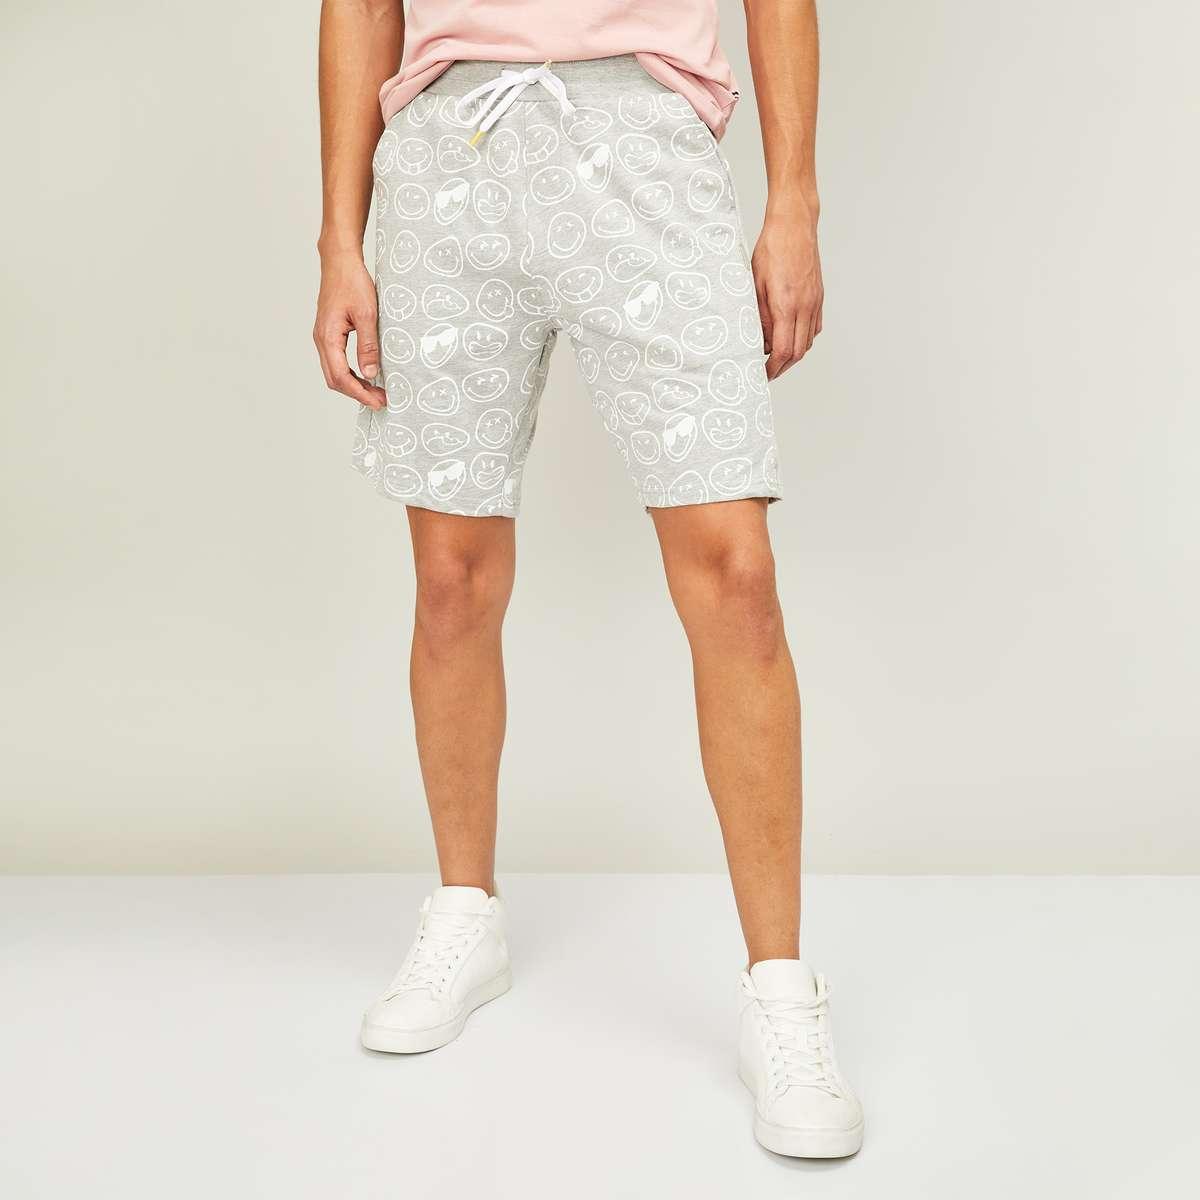 4.SMILEYWORLD Men Printed Shorts